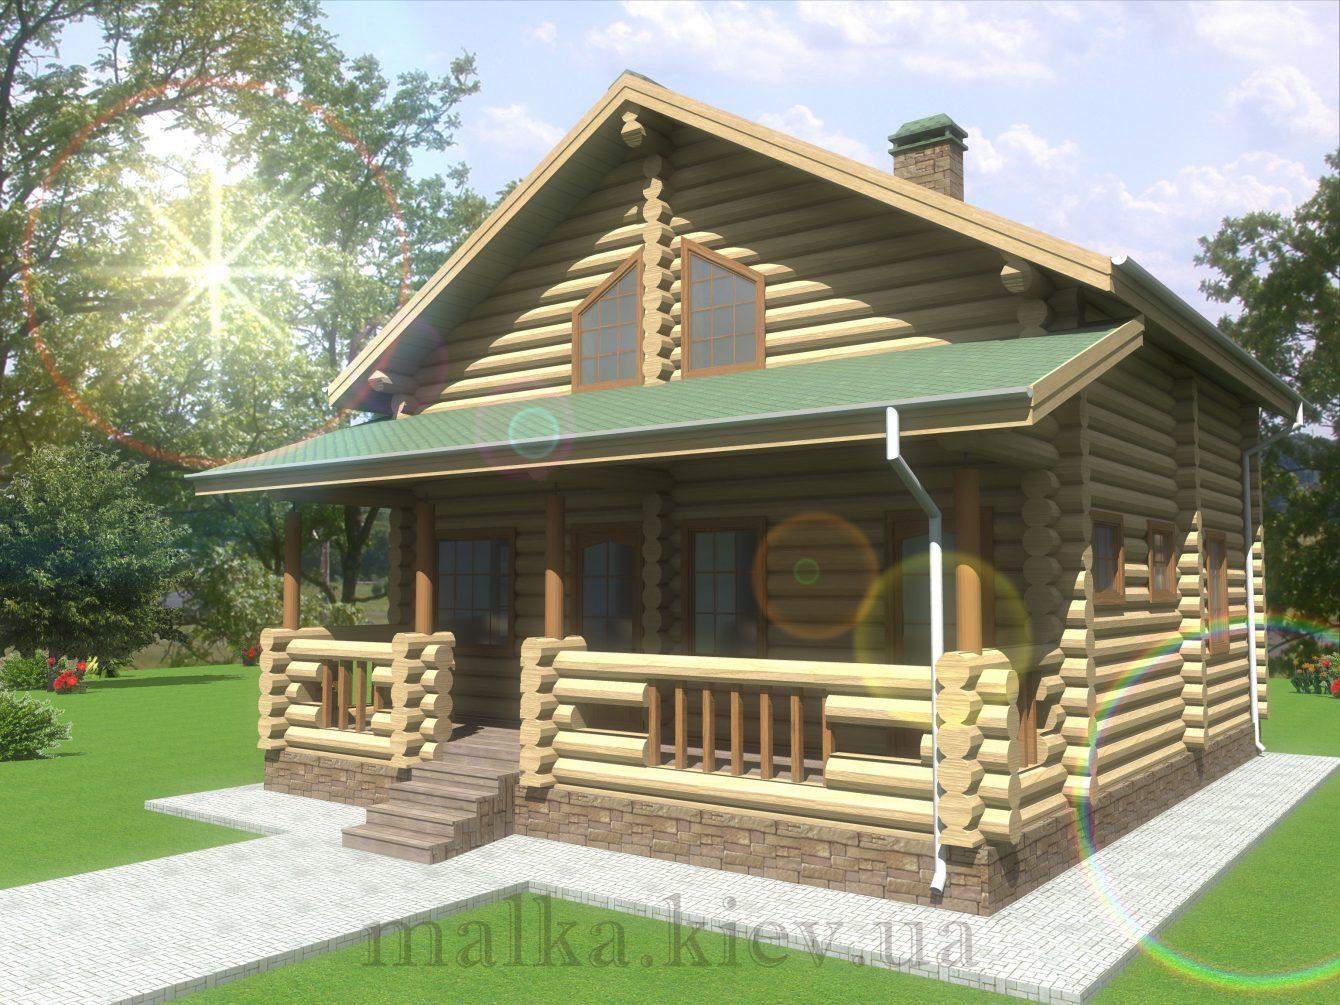 Проект жилого дома №73